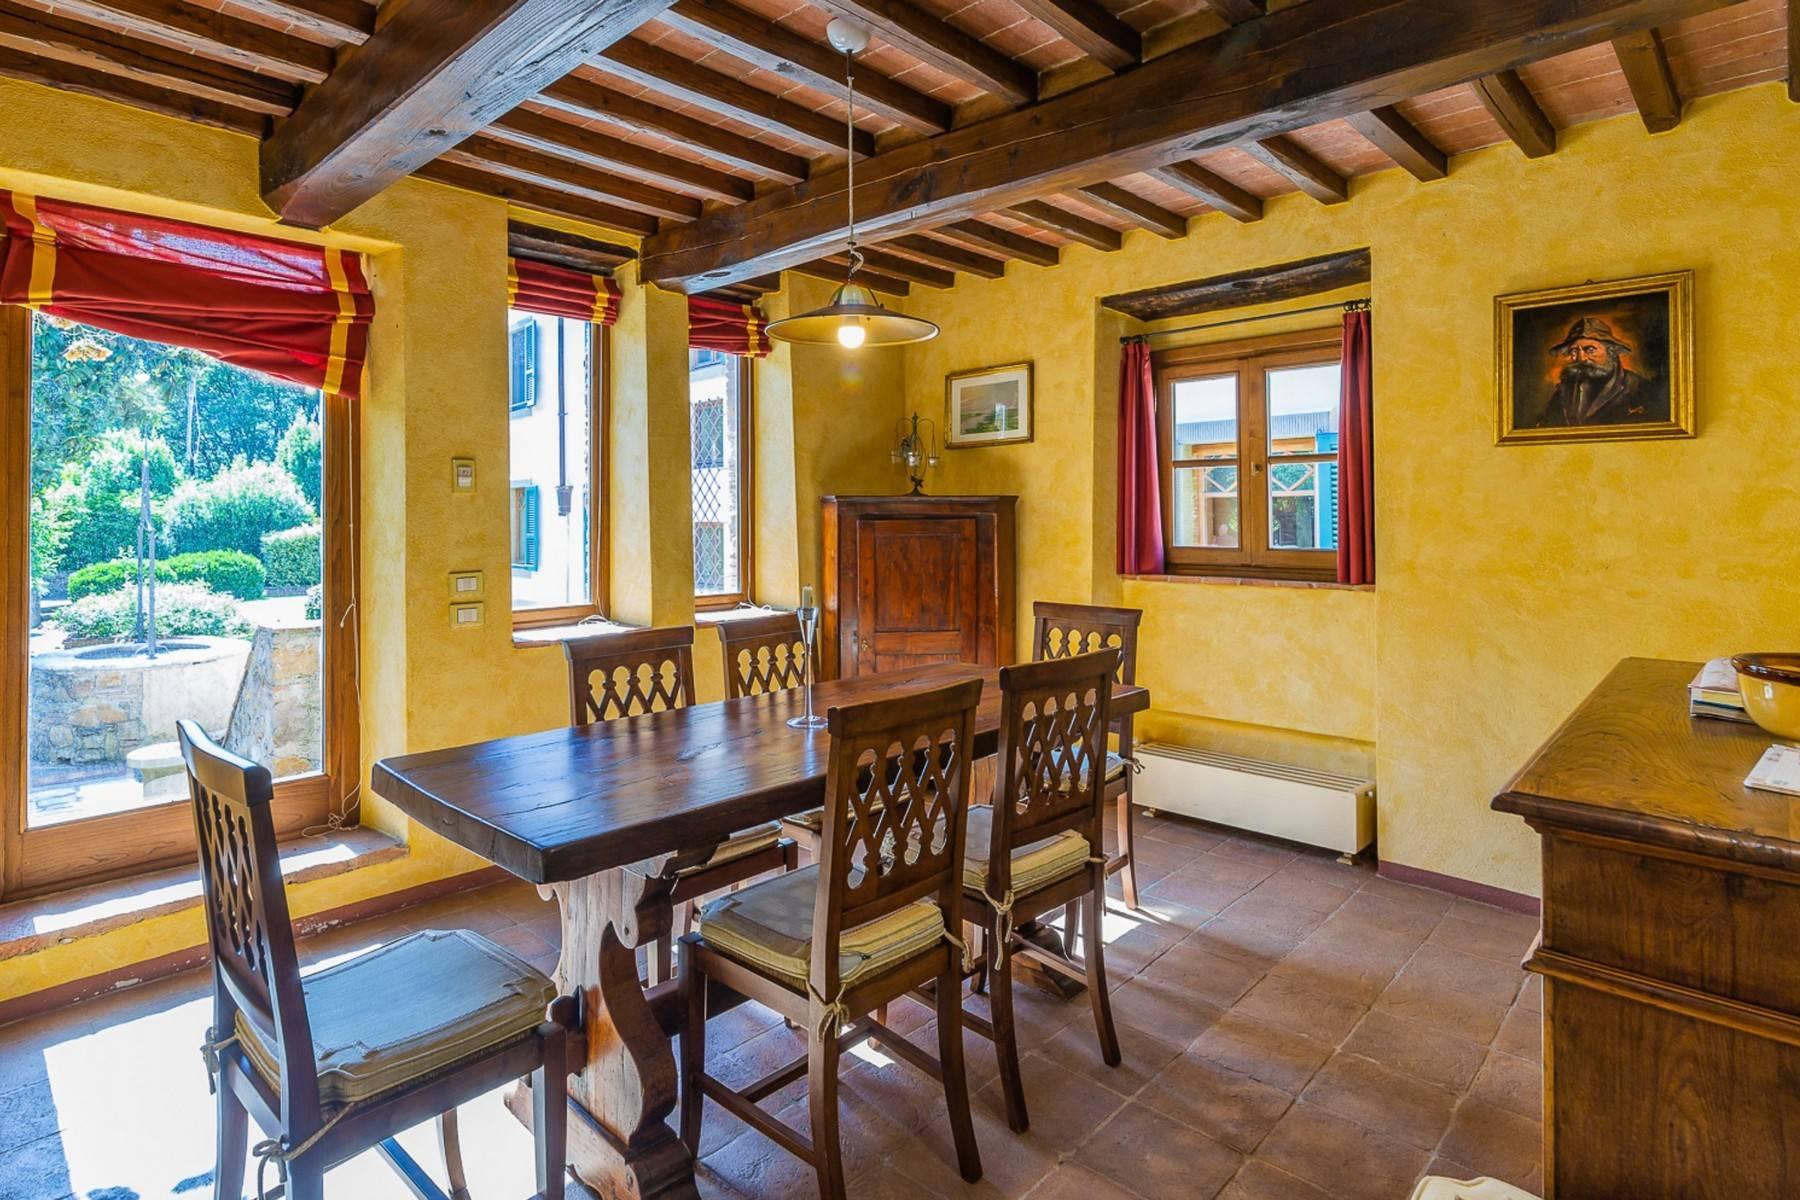 Villa in Vendita a Lucca: 5 locali, 1130 mq - Foto 20